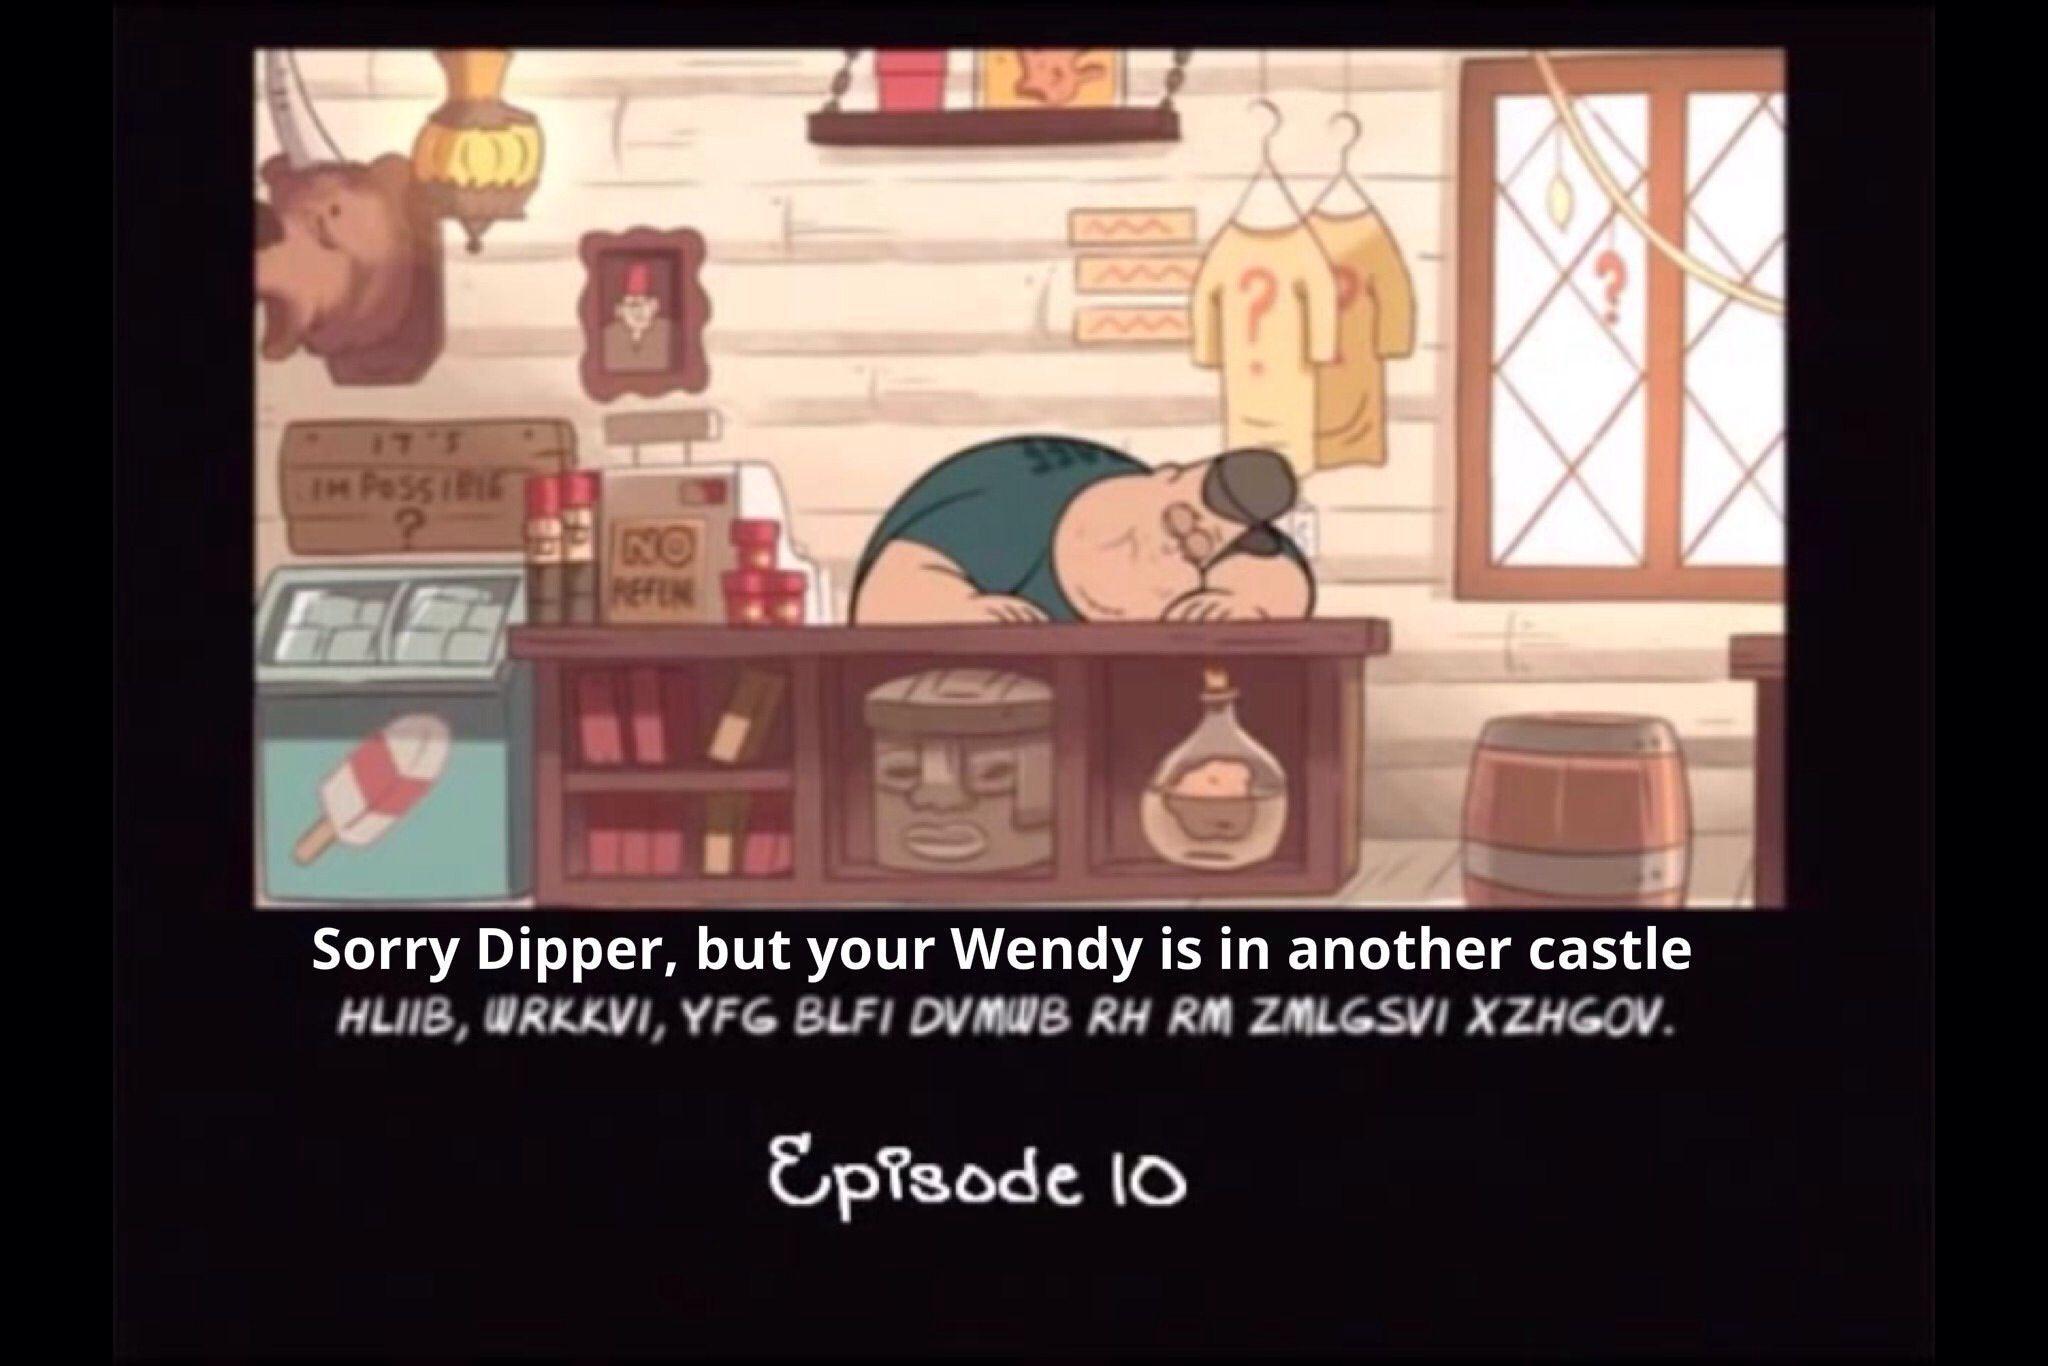 Season 1 Episode 10 S Secret Message Gravity Falls Funny Gravity Falls Secrets Gravity Falls Theory